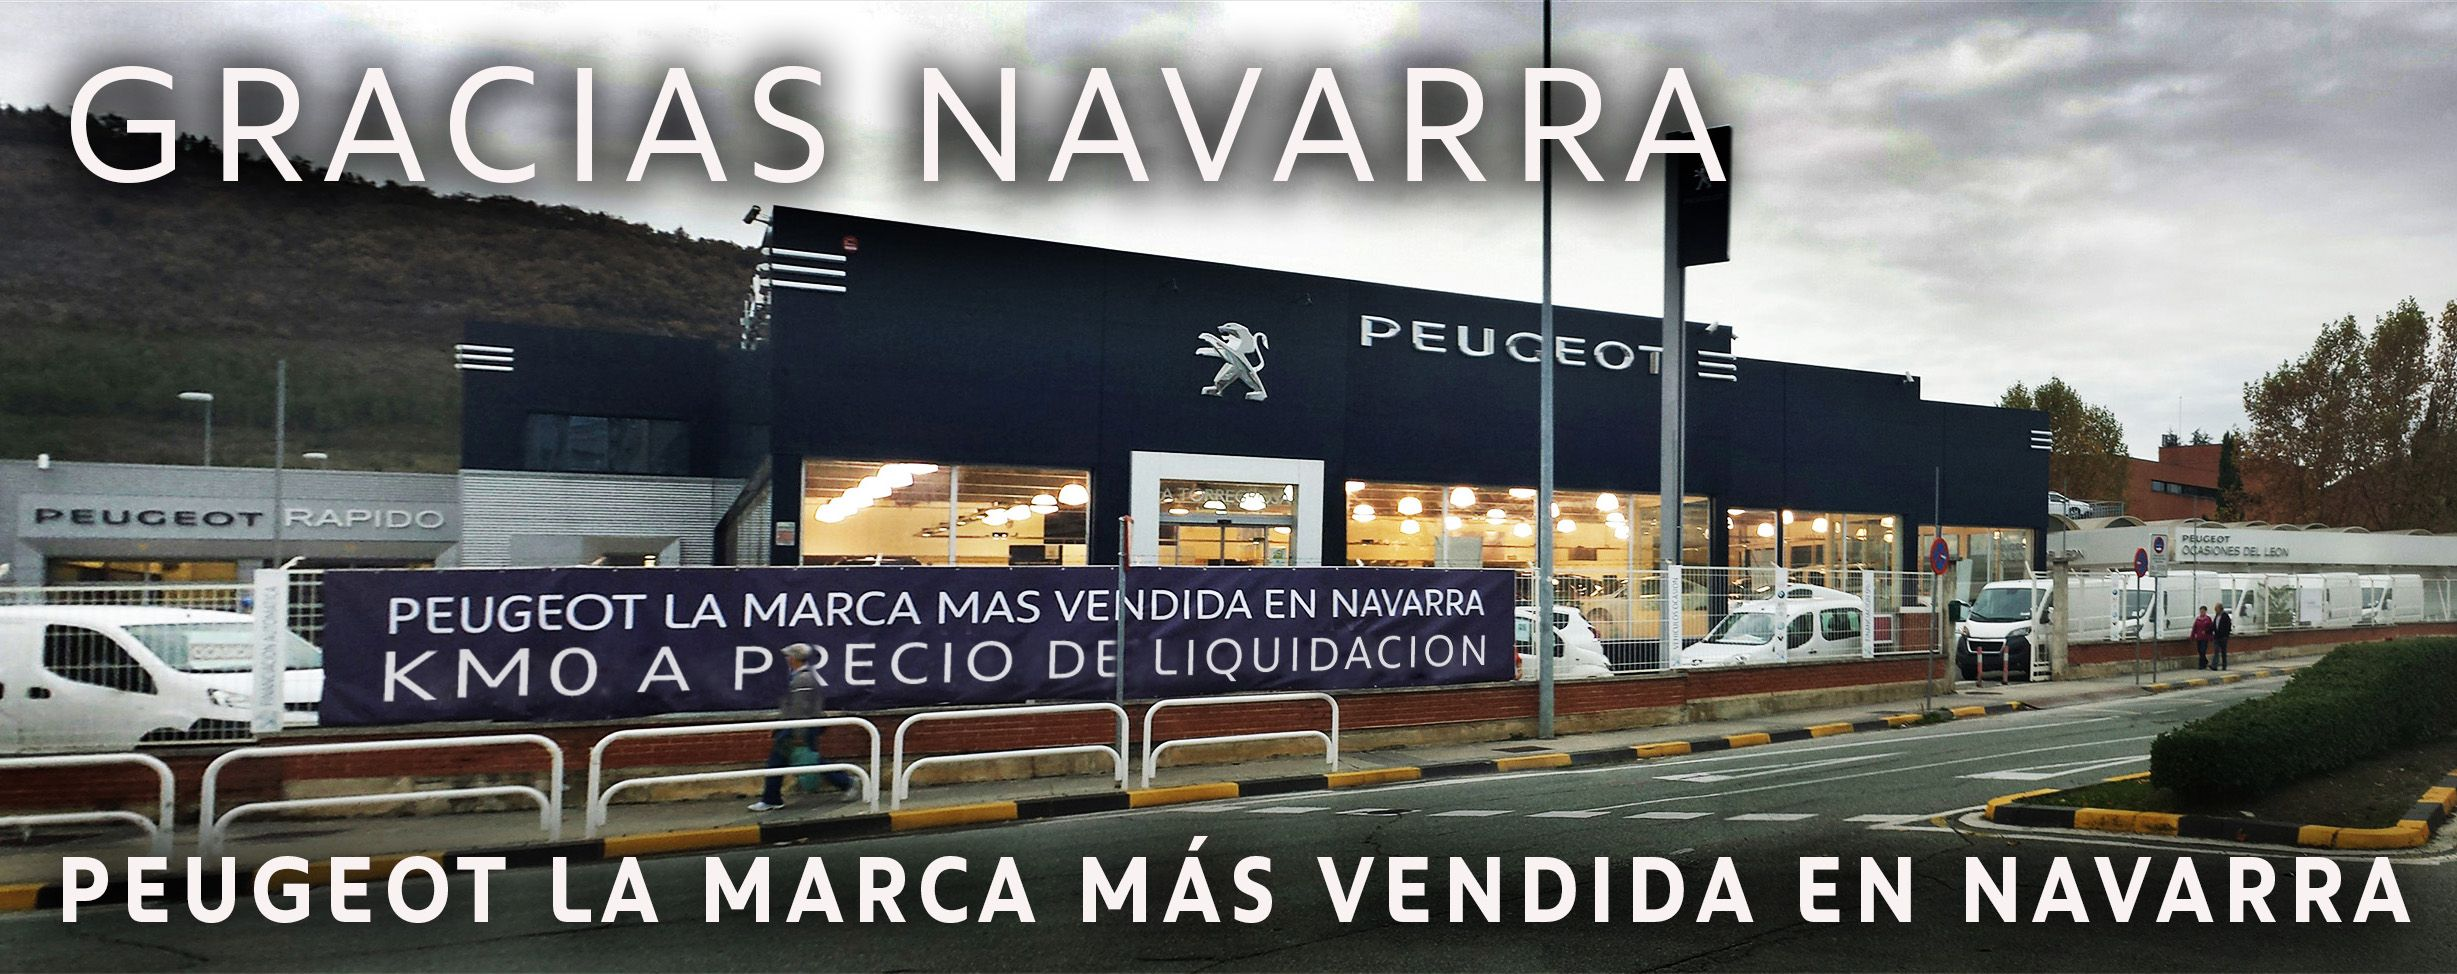 PEUGEOT LA MARCA MÁS VENDIDA EN NAVARRA